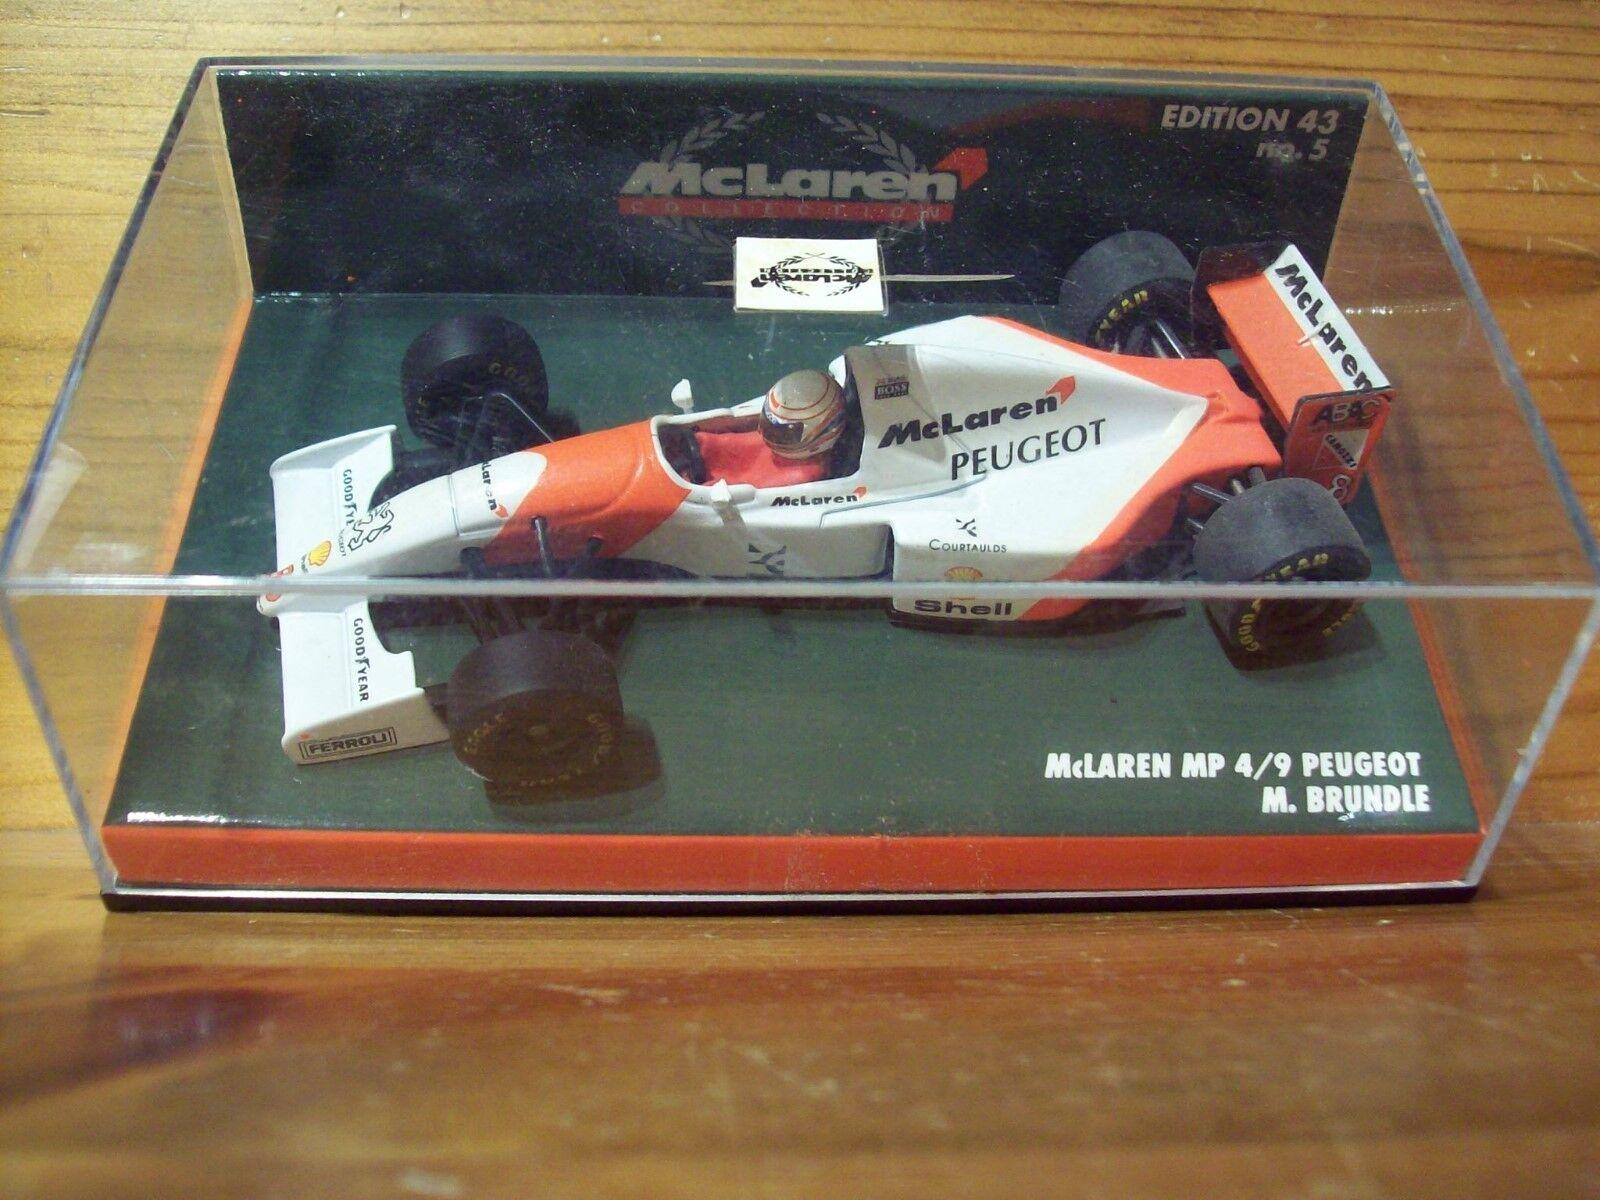 McLaren MP4 9 PEUGEOT 1994 MARTIN BRUNDLE